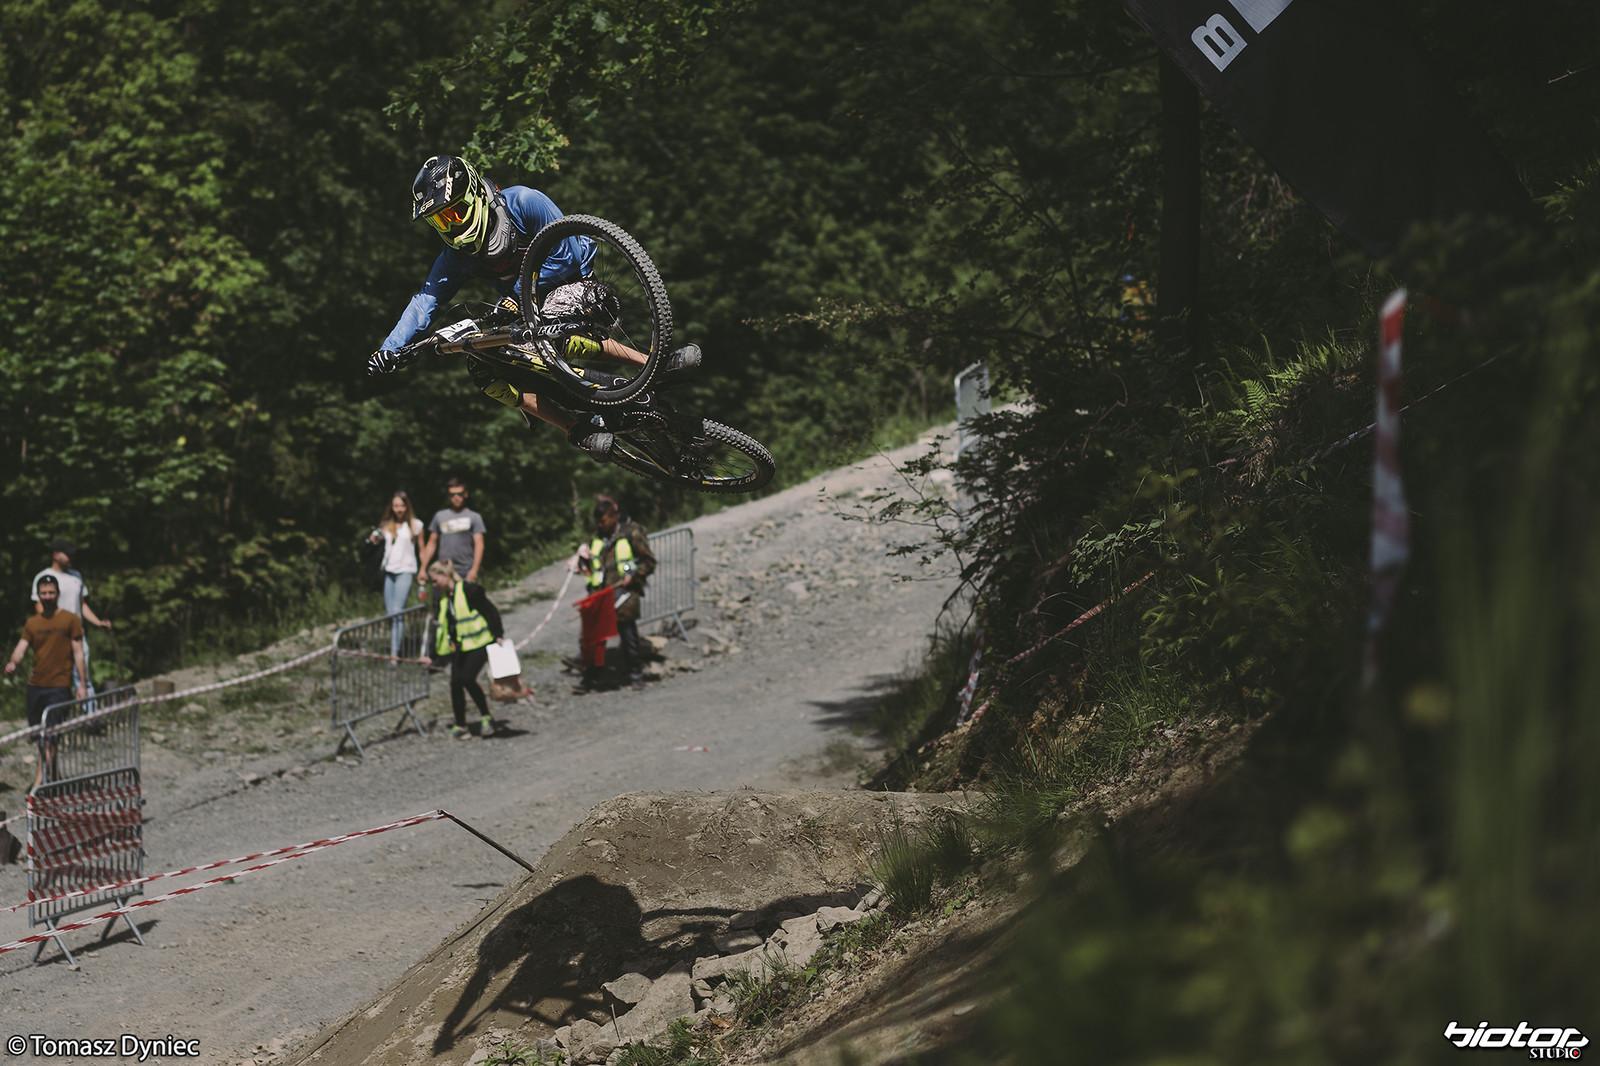 Fully chillin - Tomasz_Dyniec - Mountain Biking Pictures - Vital MTB